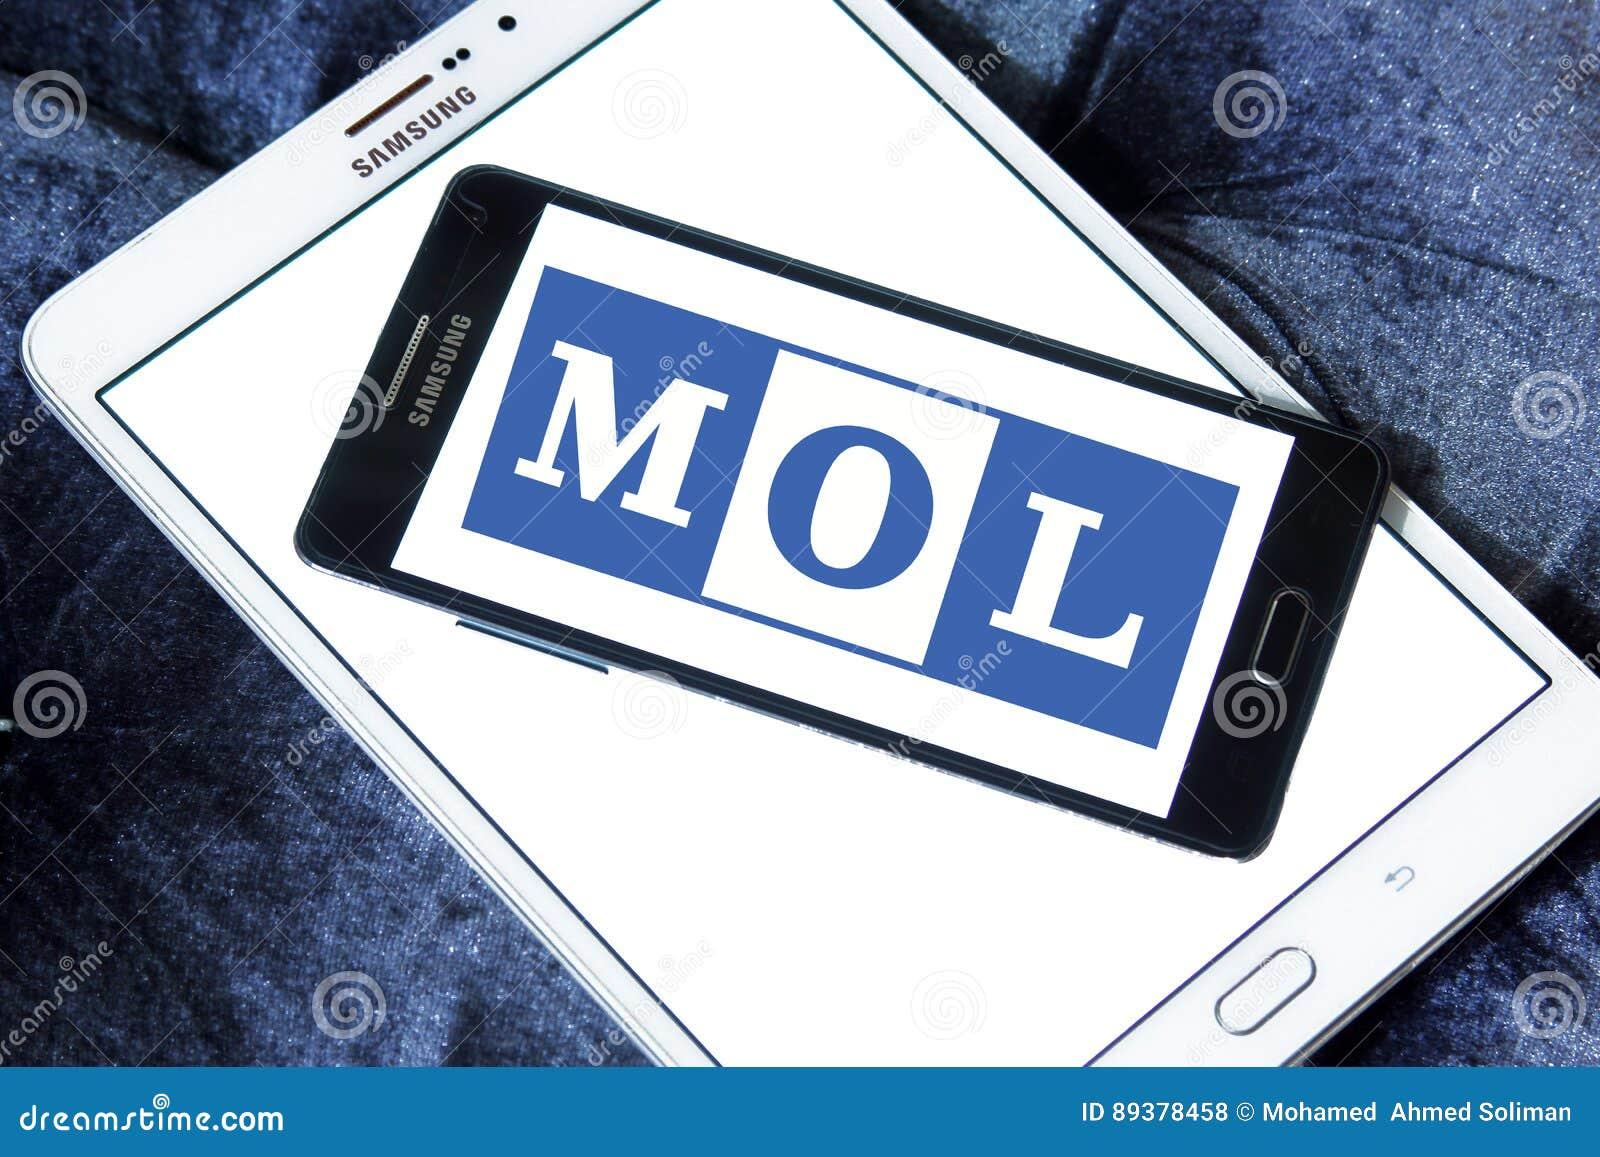 mol shipping logo editorial image cartoondealercom